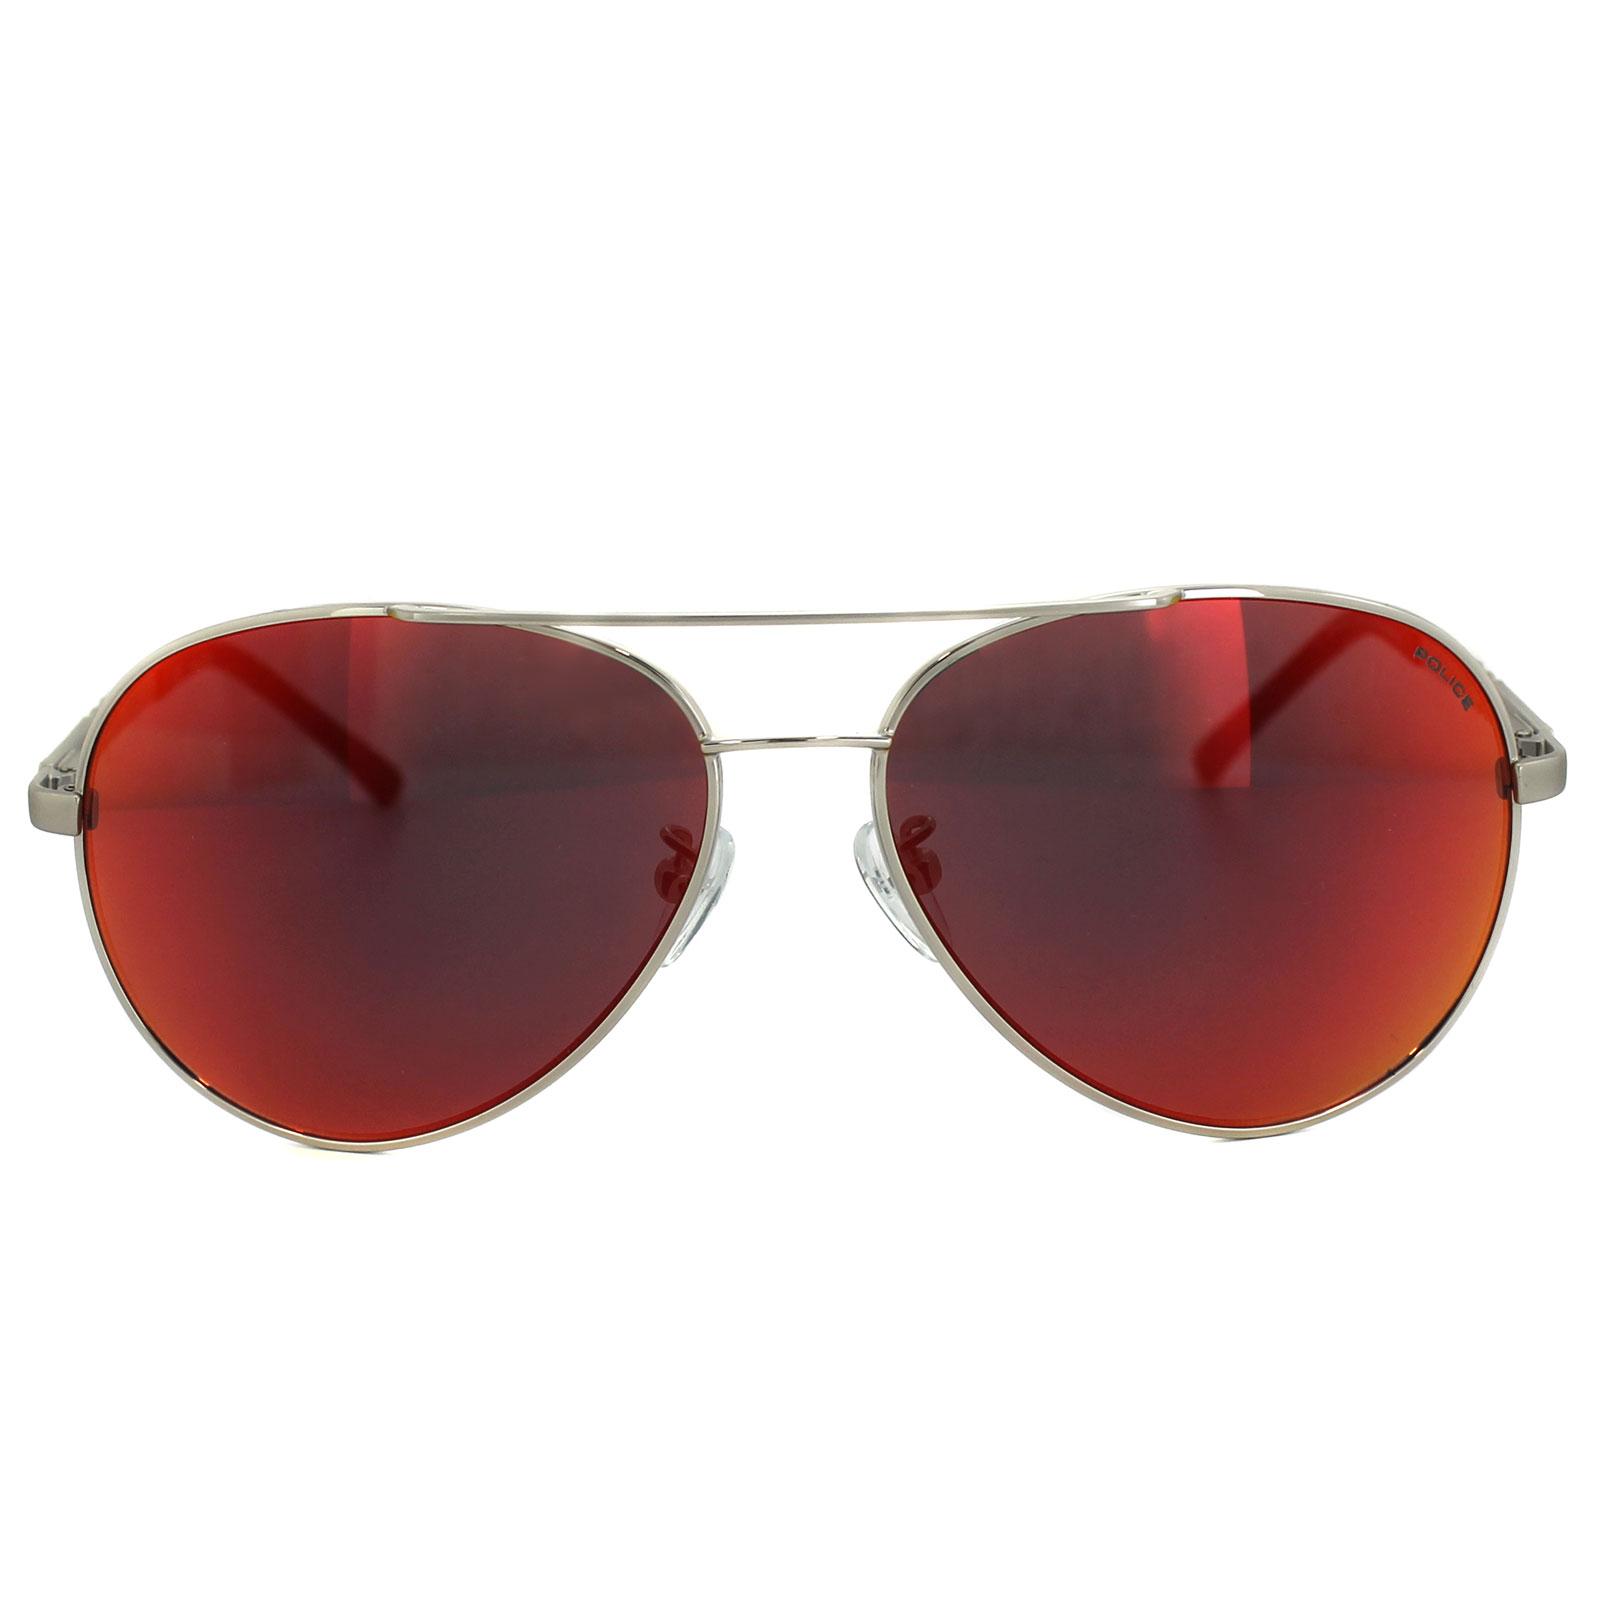 b4b30c793e Sentinel Police Sunglasses Legend 2 8746 589R Shiny Palladium Red Mirror